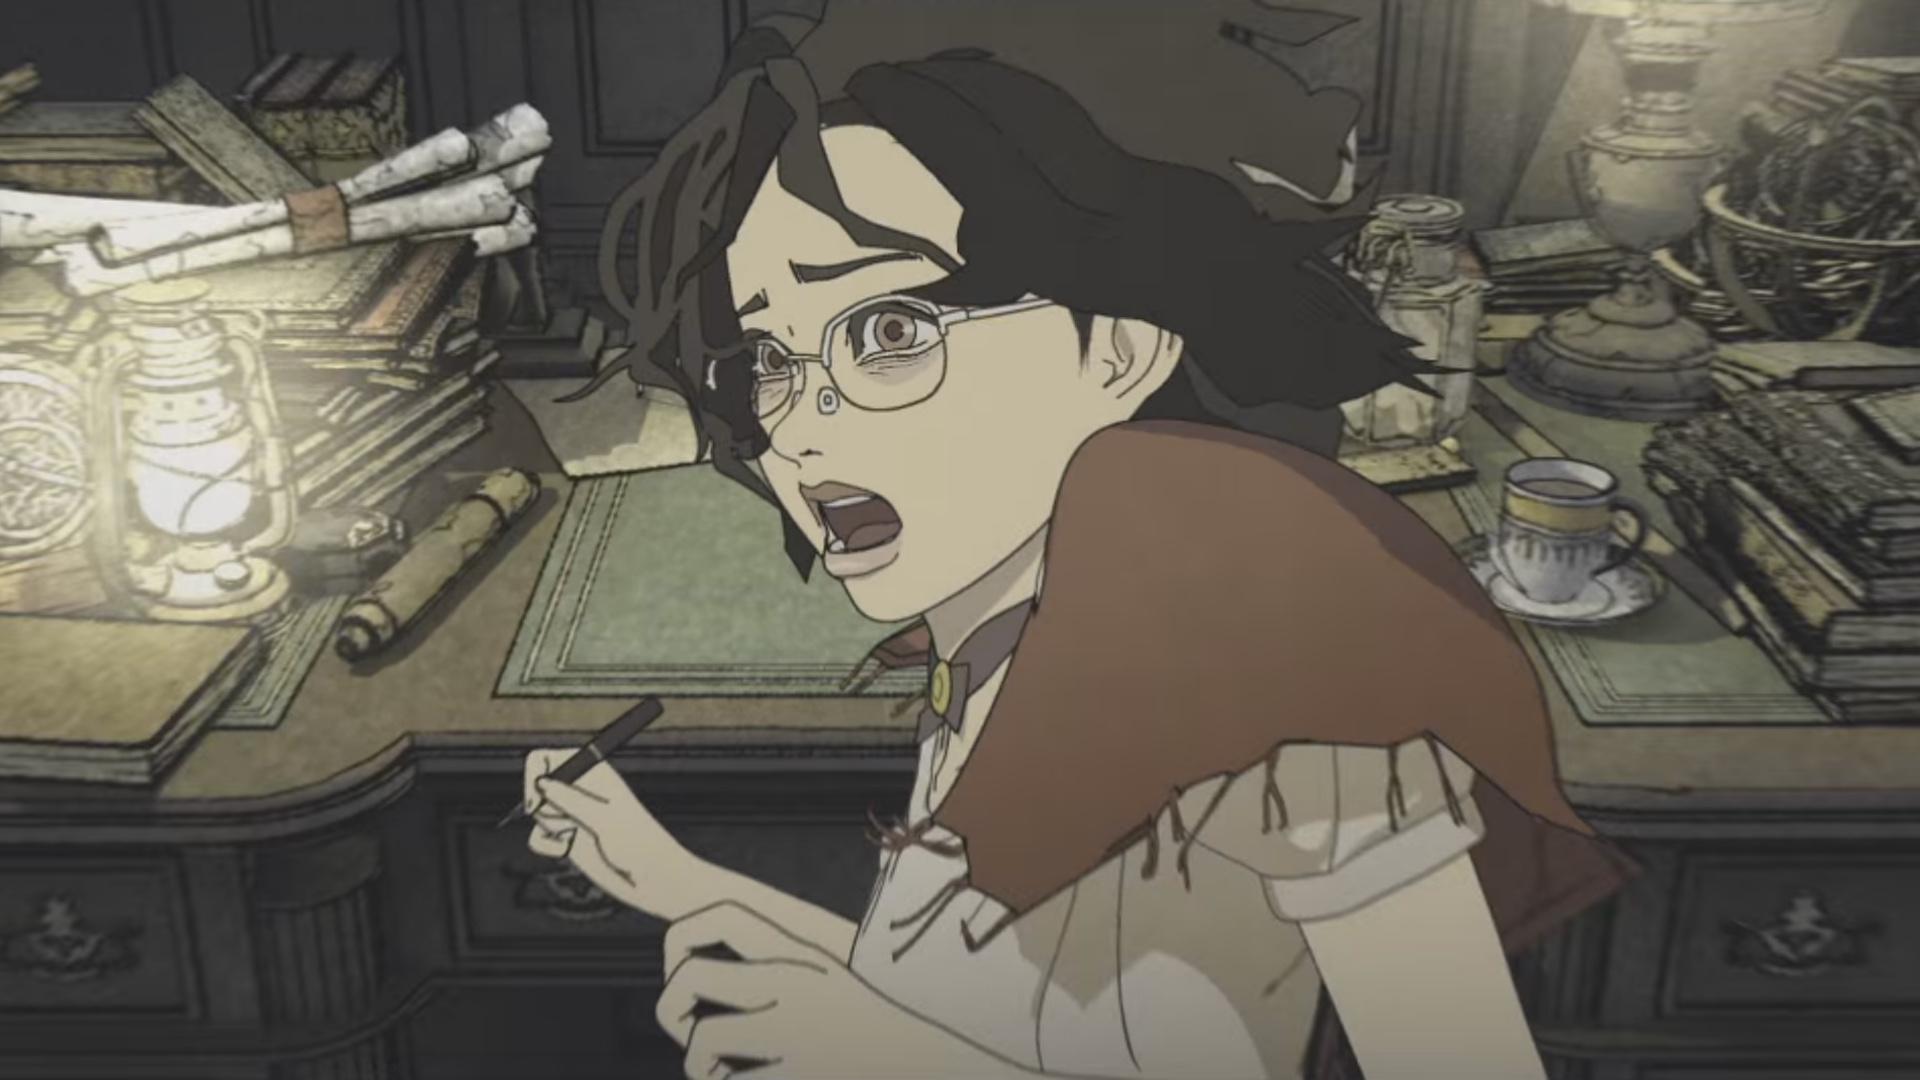 cthulhu anime